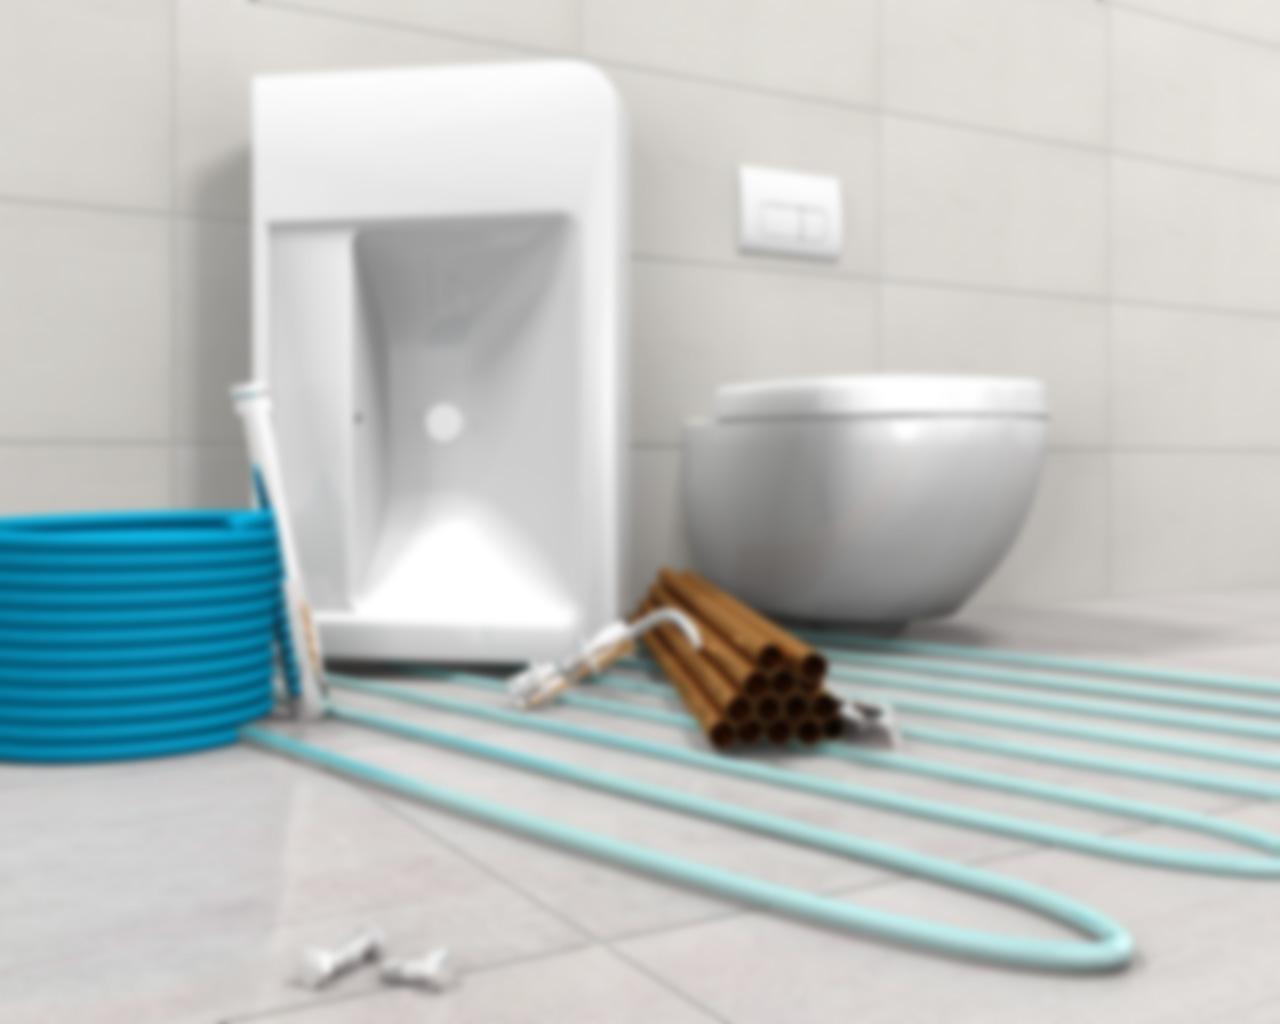 sanitaerinstallationen sanitär badplanung montage